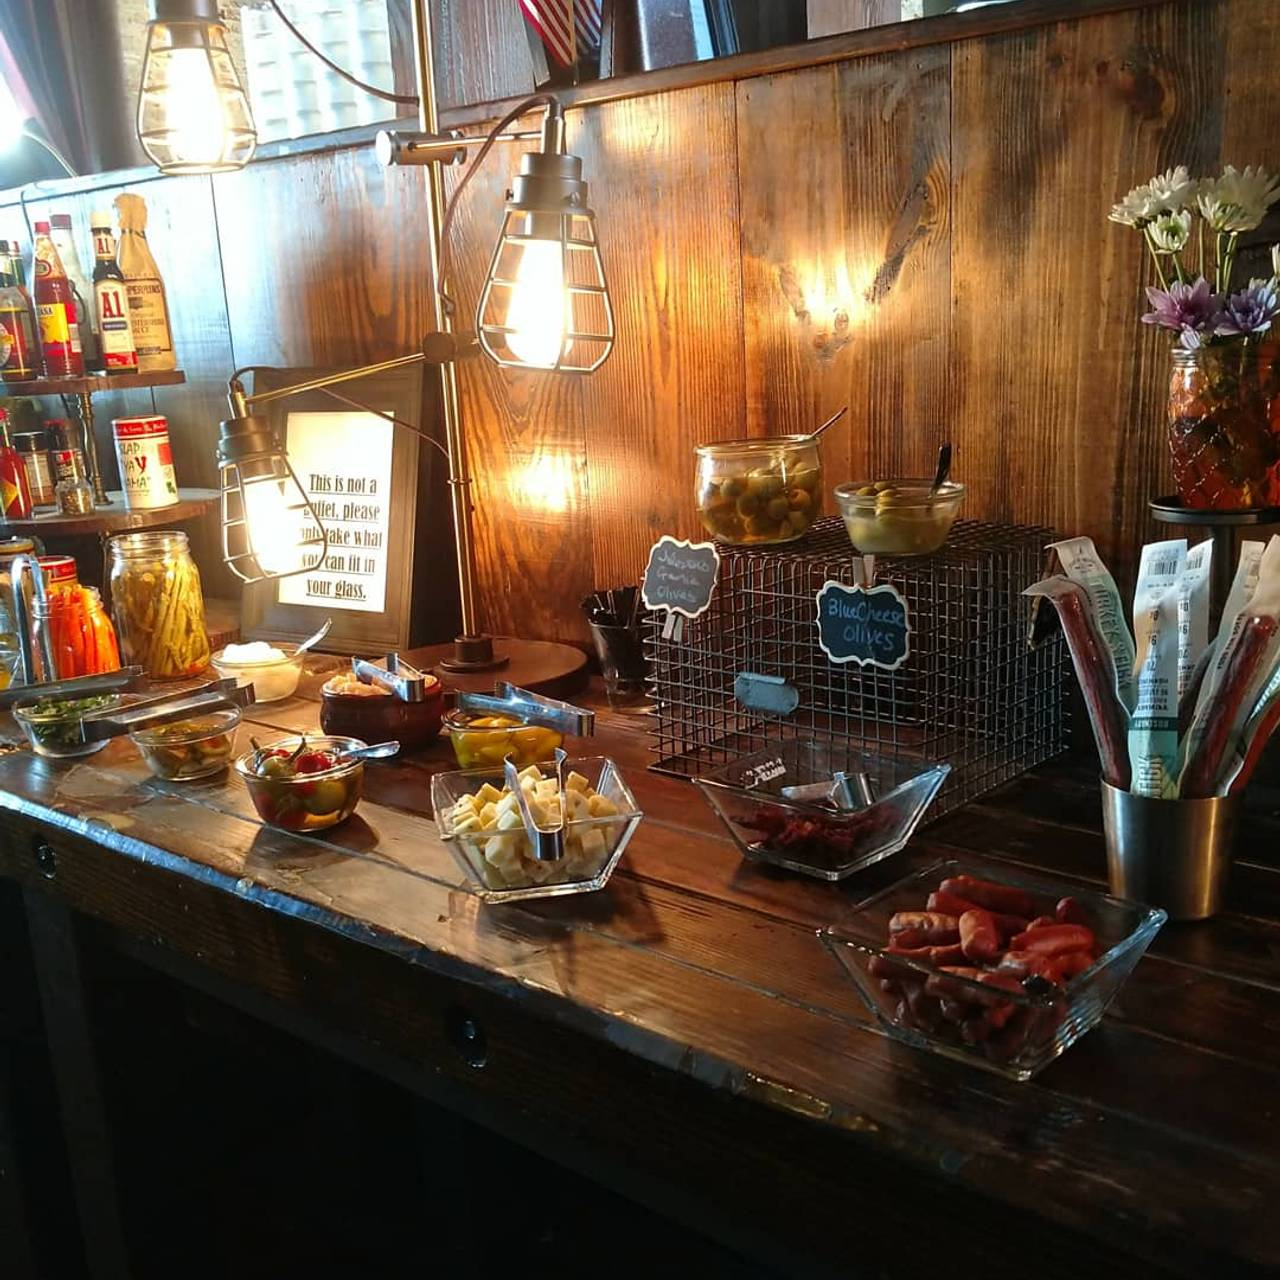 Ross&Hall Beer Garten & Kitchen Restaurant - Dallas, TX | OpenTable